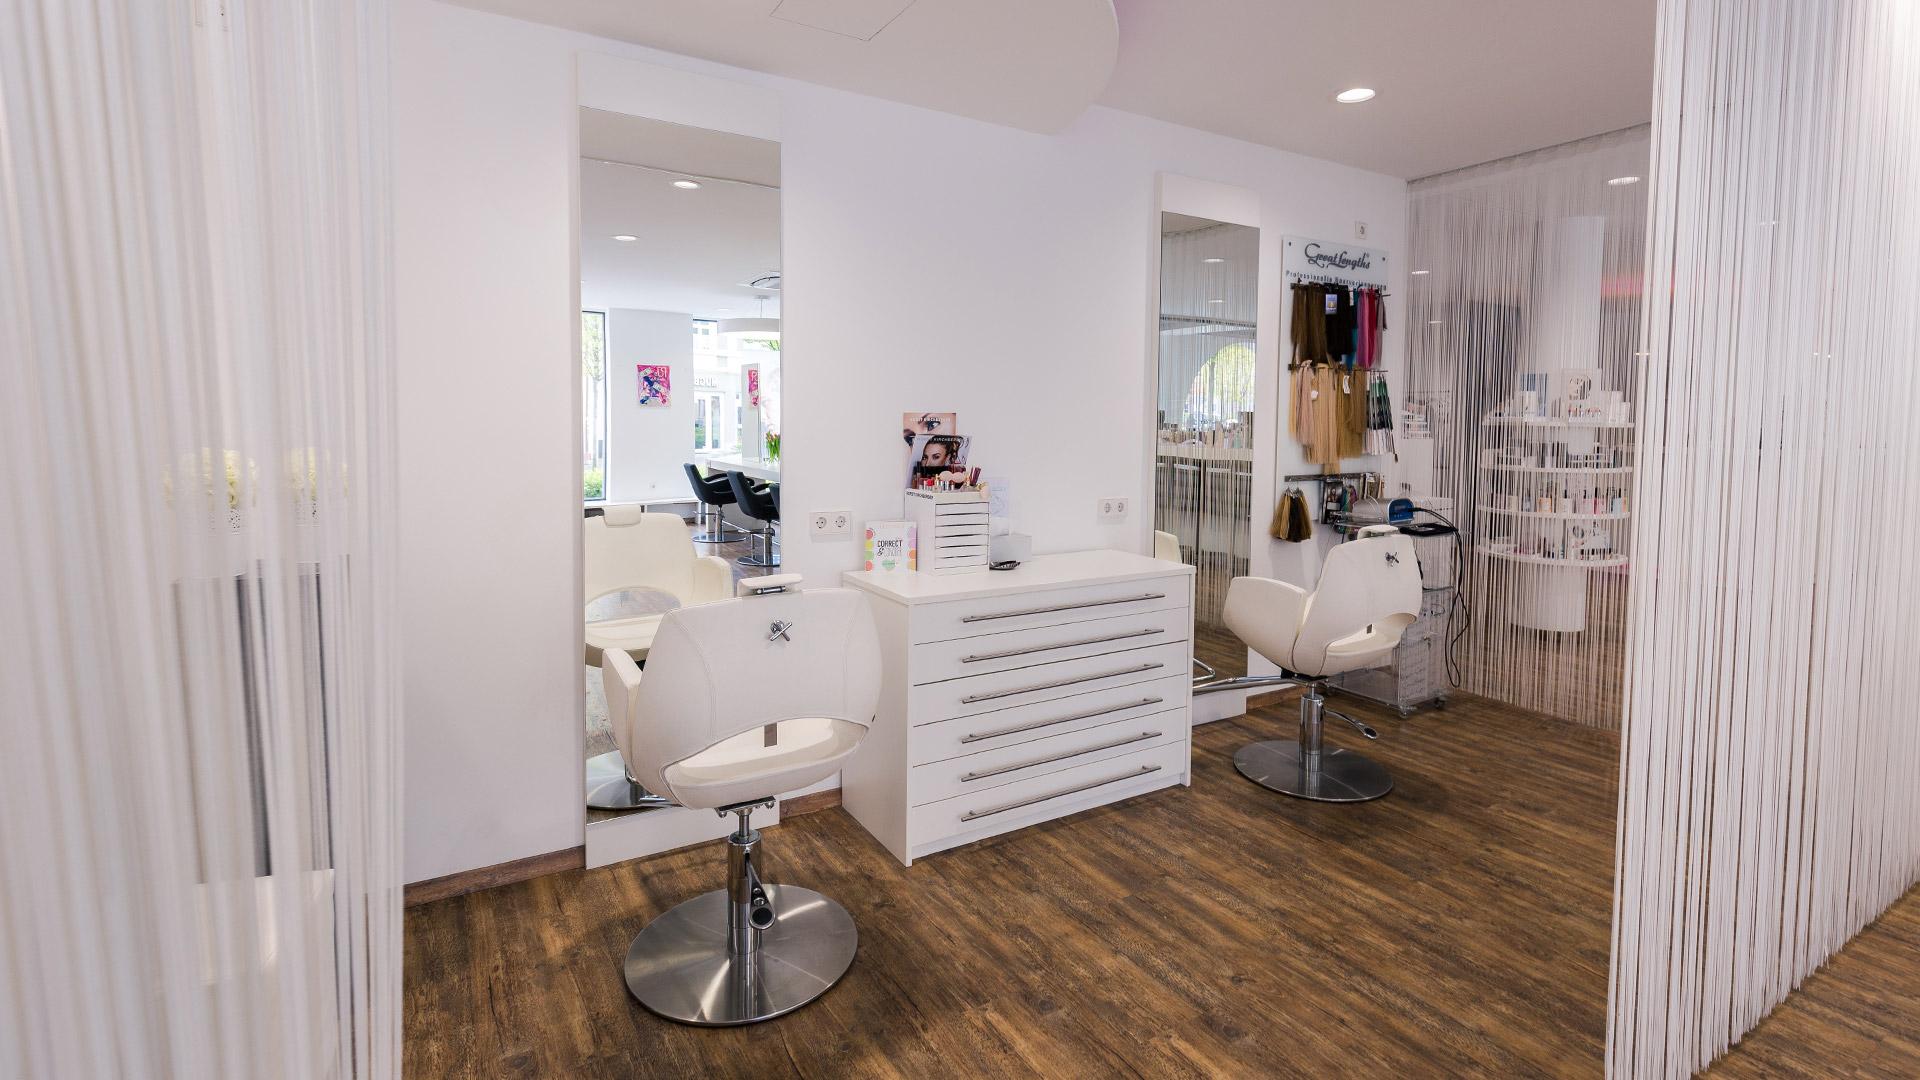 PJs Hair & Style - Website - Bilder - Salon 4